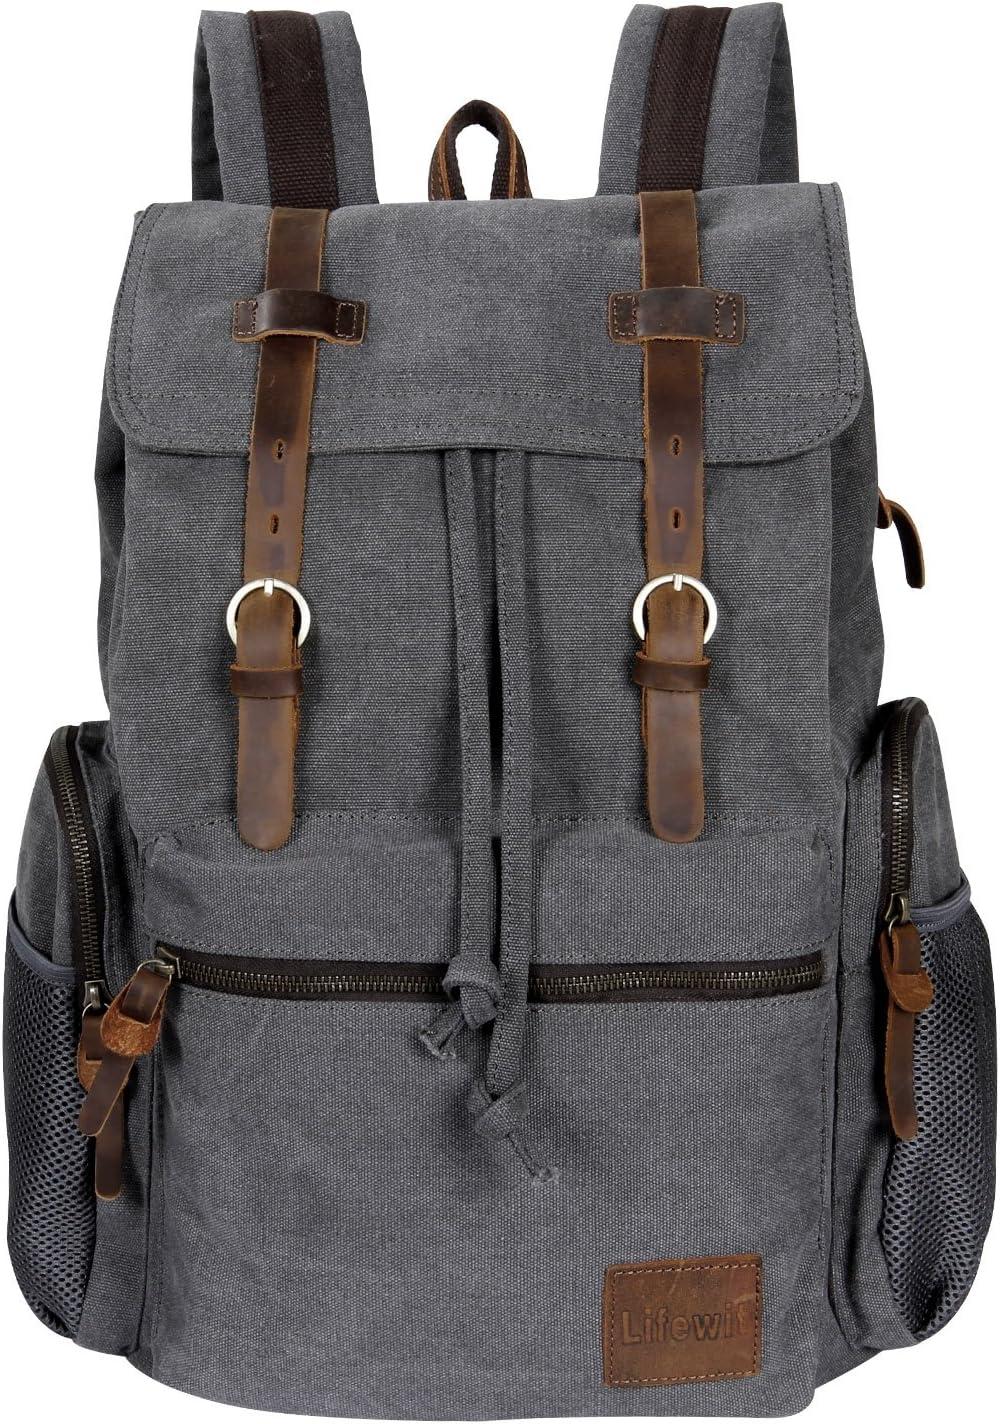 Lifewit 17 inch Canvas Backpack Vintage Leather Laptop School Bag Travel Daypack